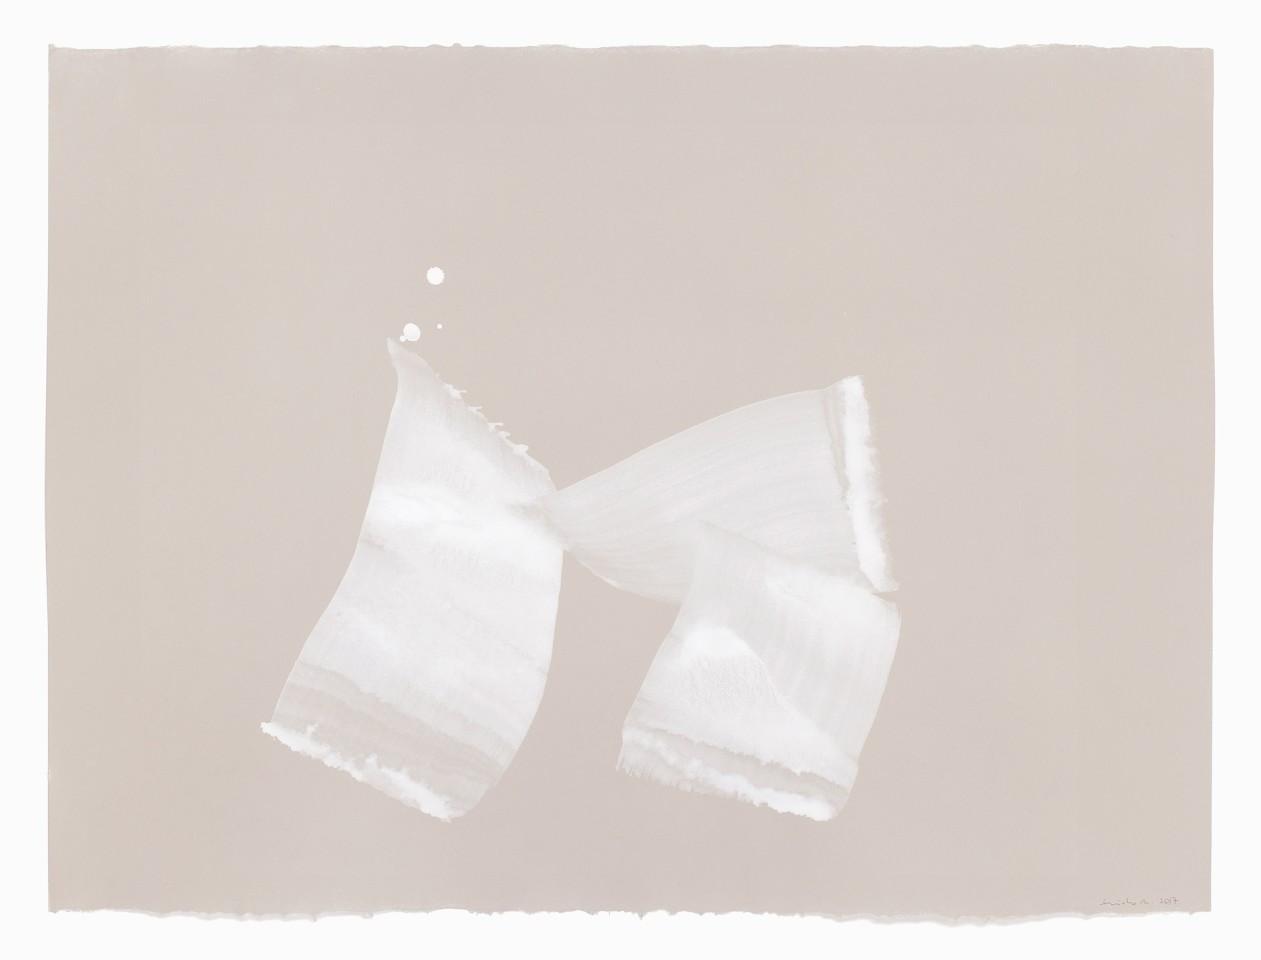 Hiroko Nakajima, #021364  Wasserblume C, 2017